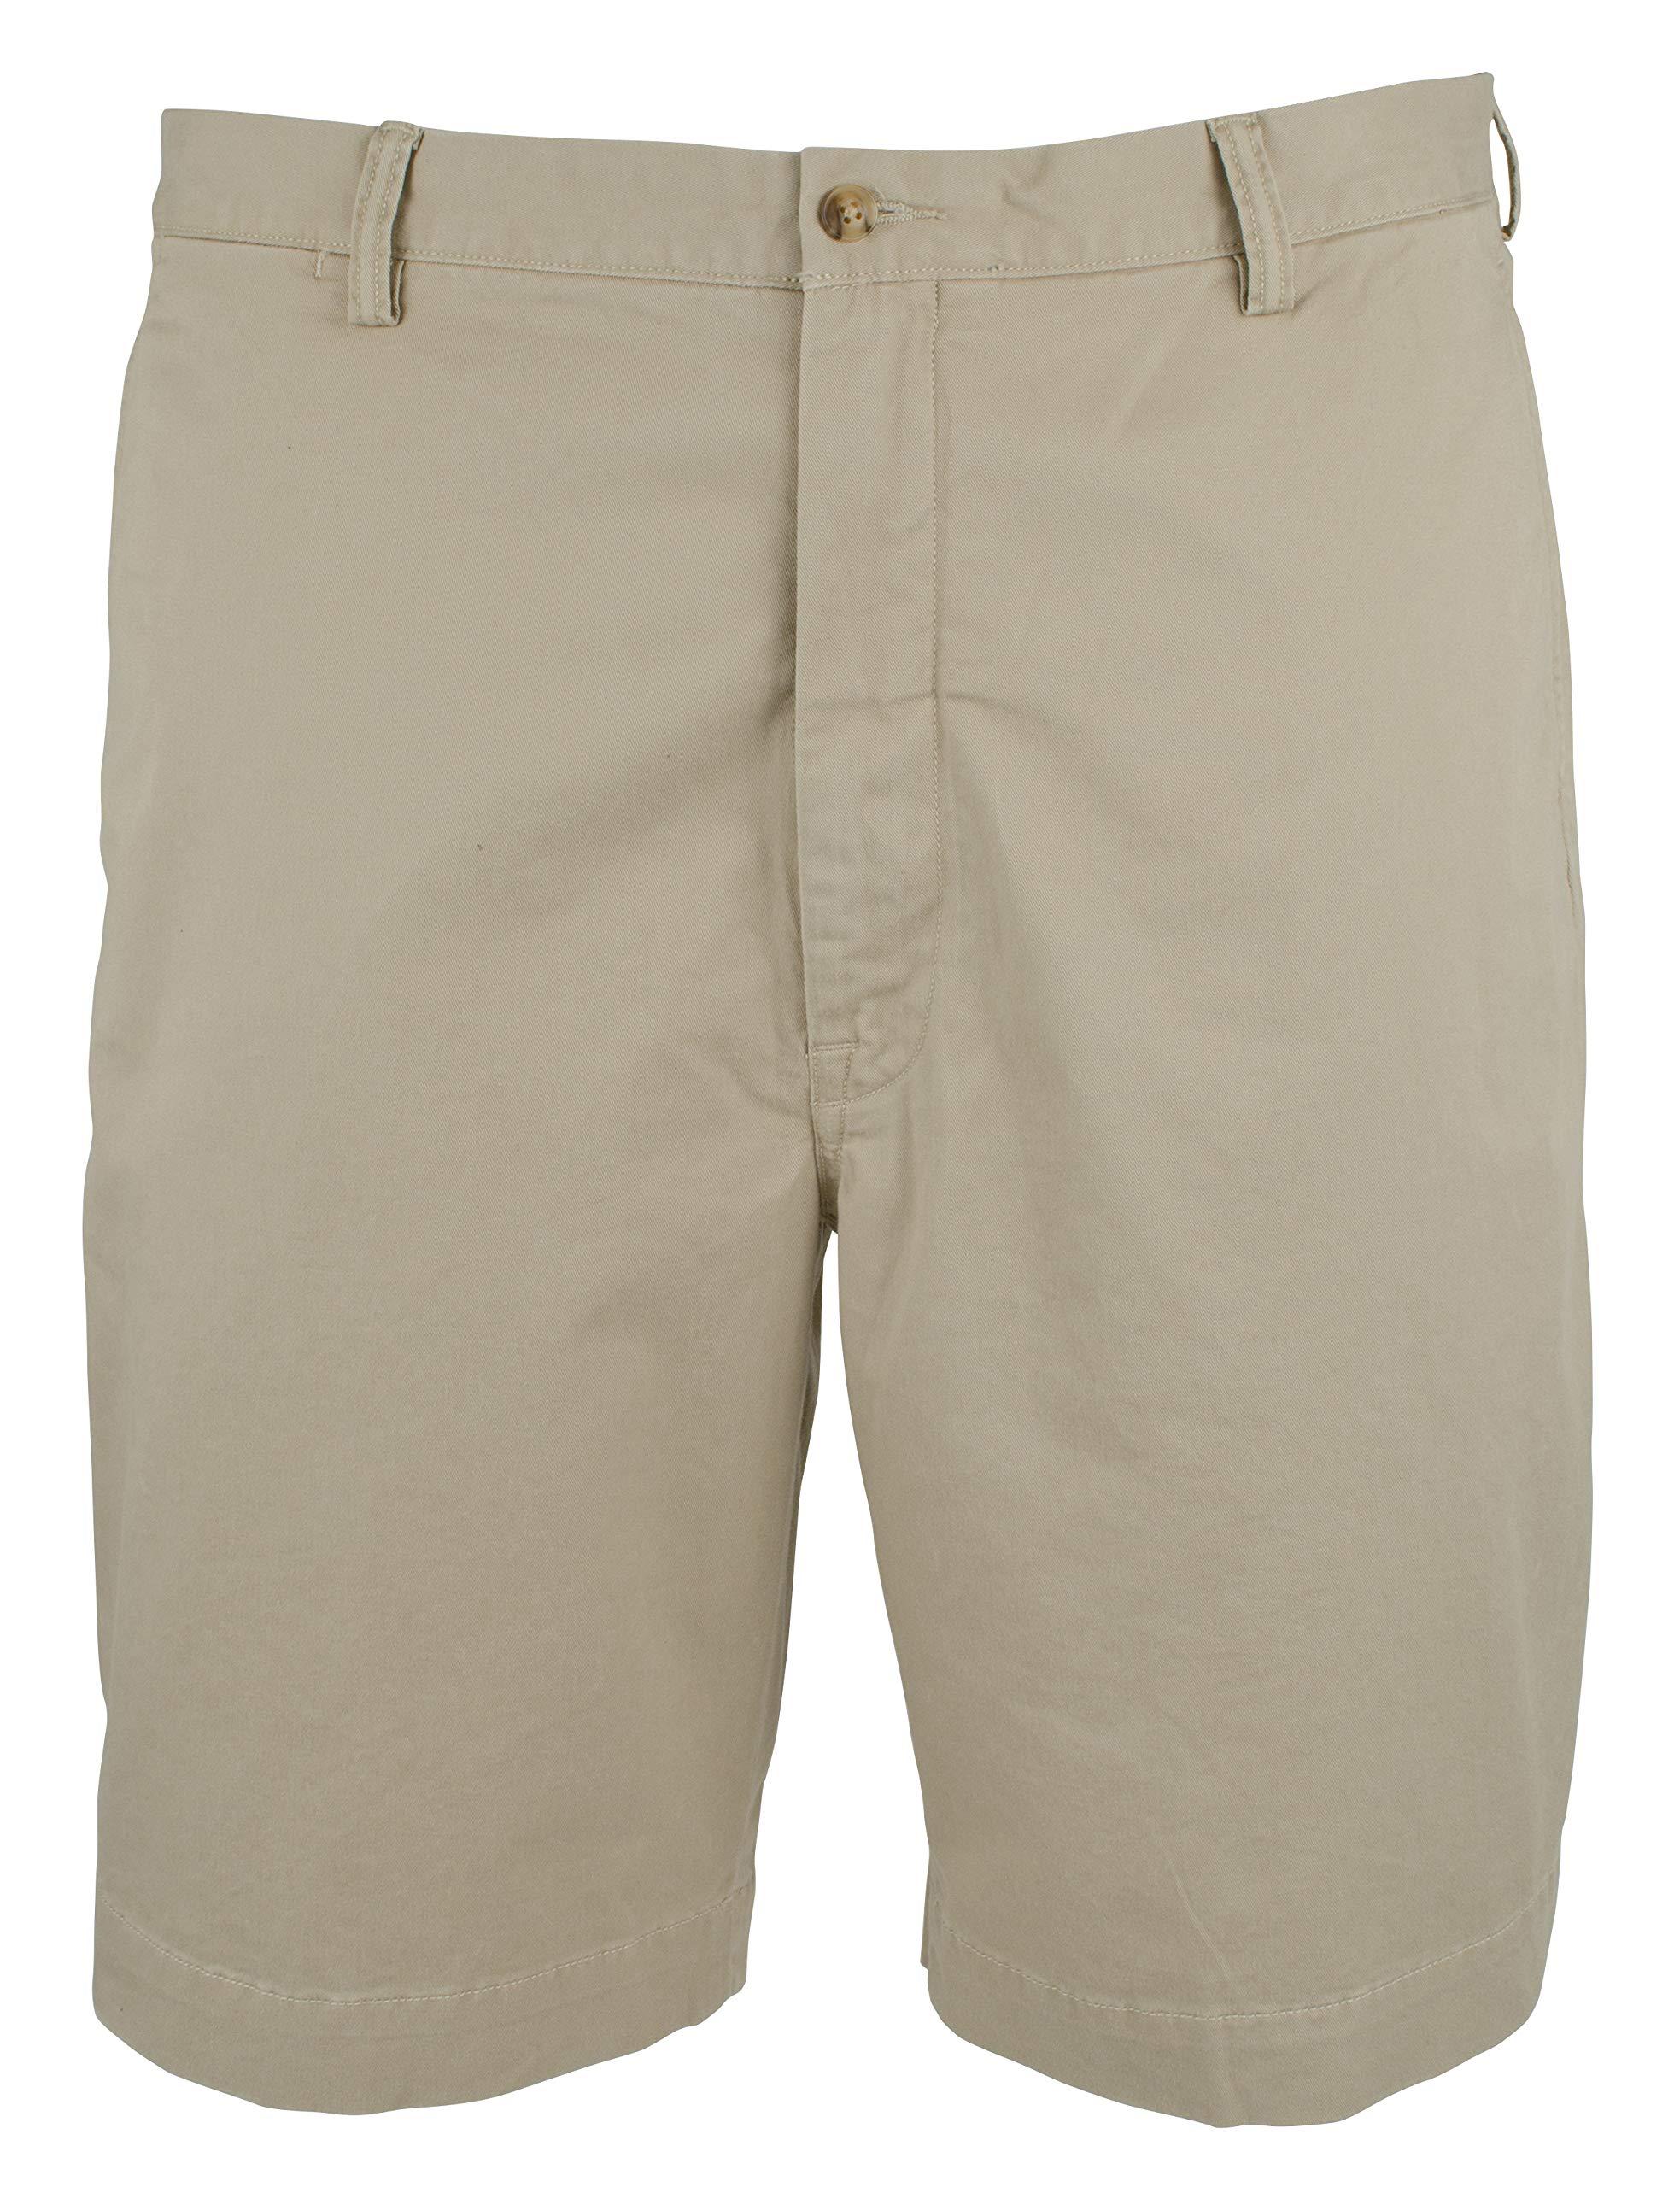 Polo Ralph Lauren Men's Big & Tall Stretch Classic Fit Shorts (46B 9, Khaki Tan)